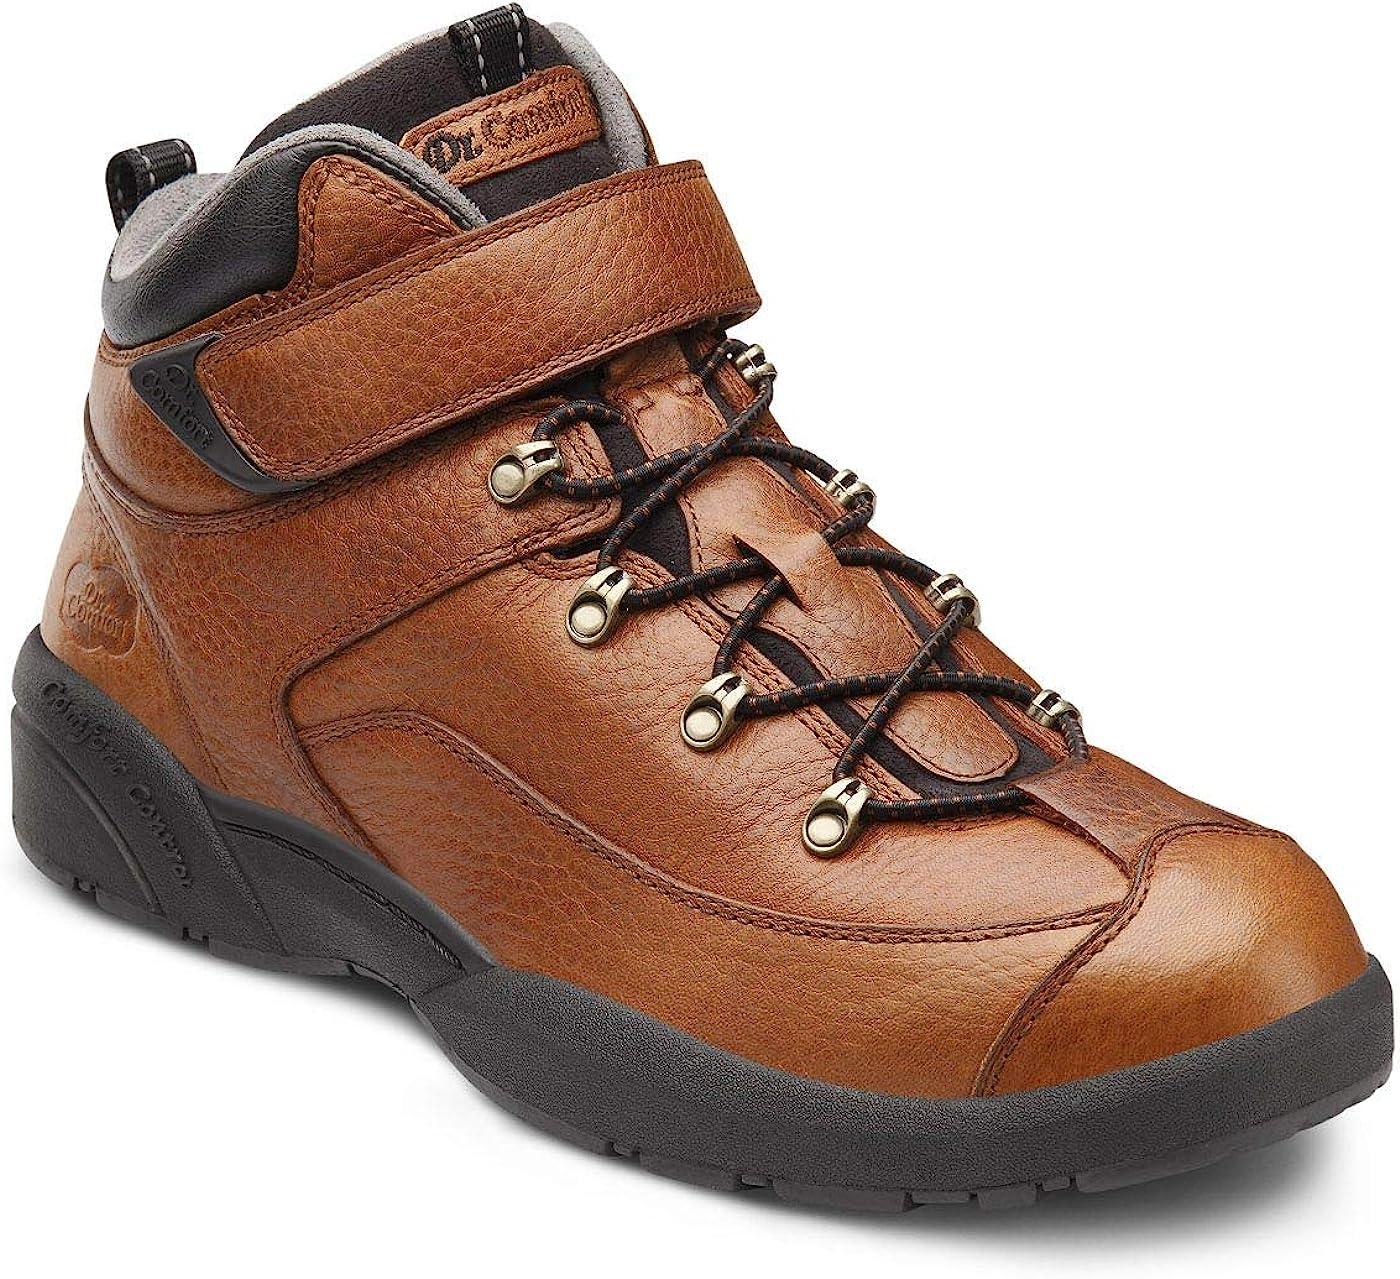 Dr. Comfort Ranger Men s Therapeutic Diabetic Extra Depth Hiking Boot